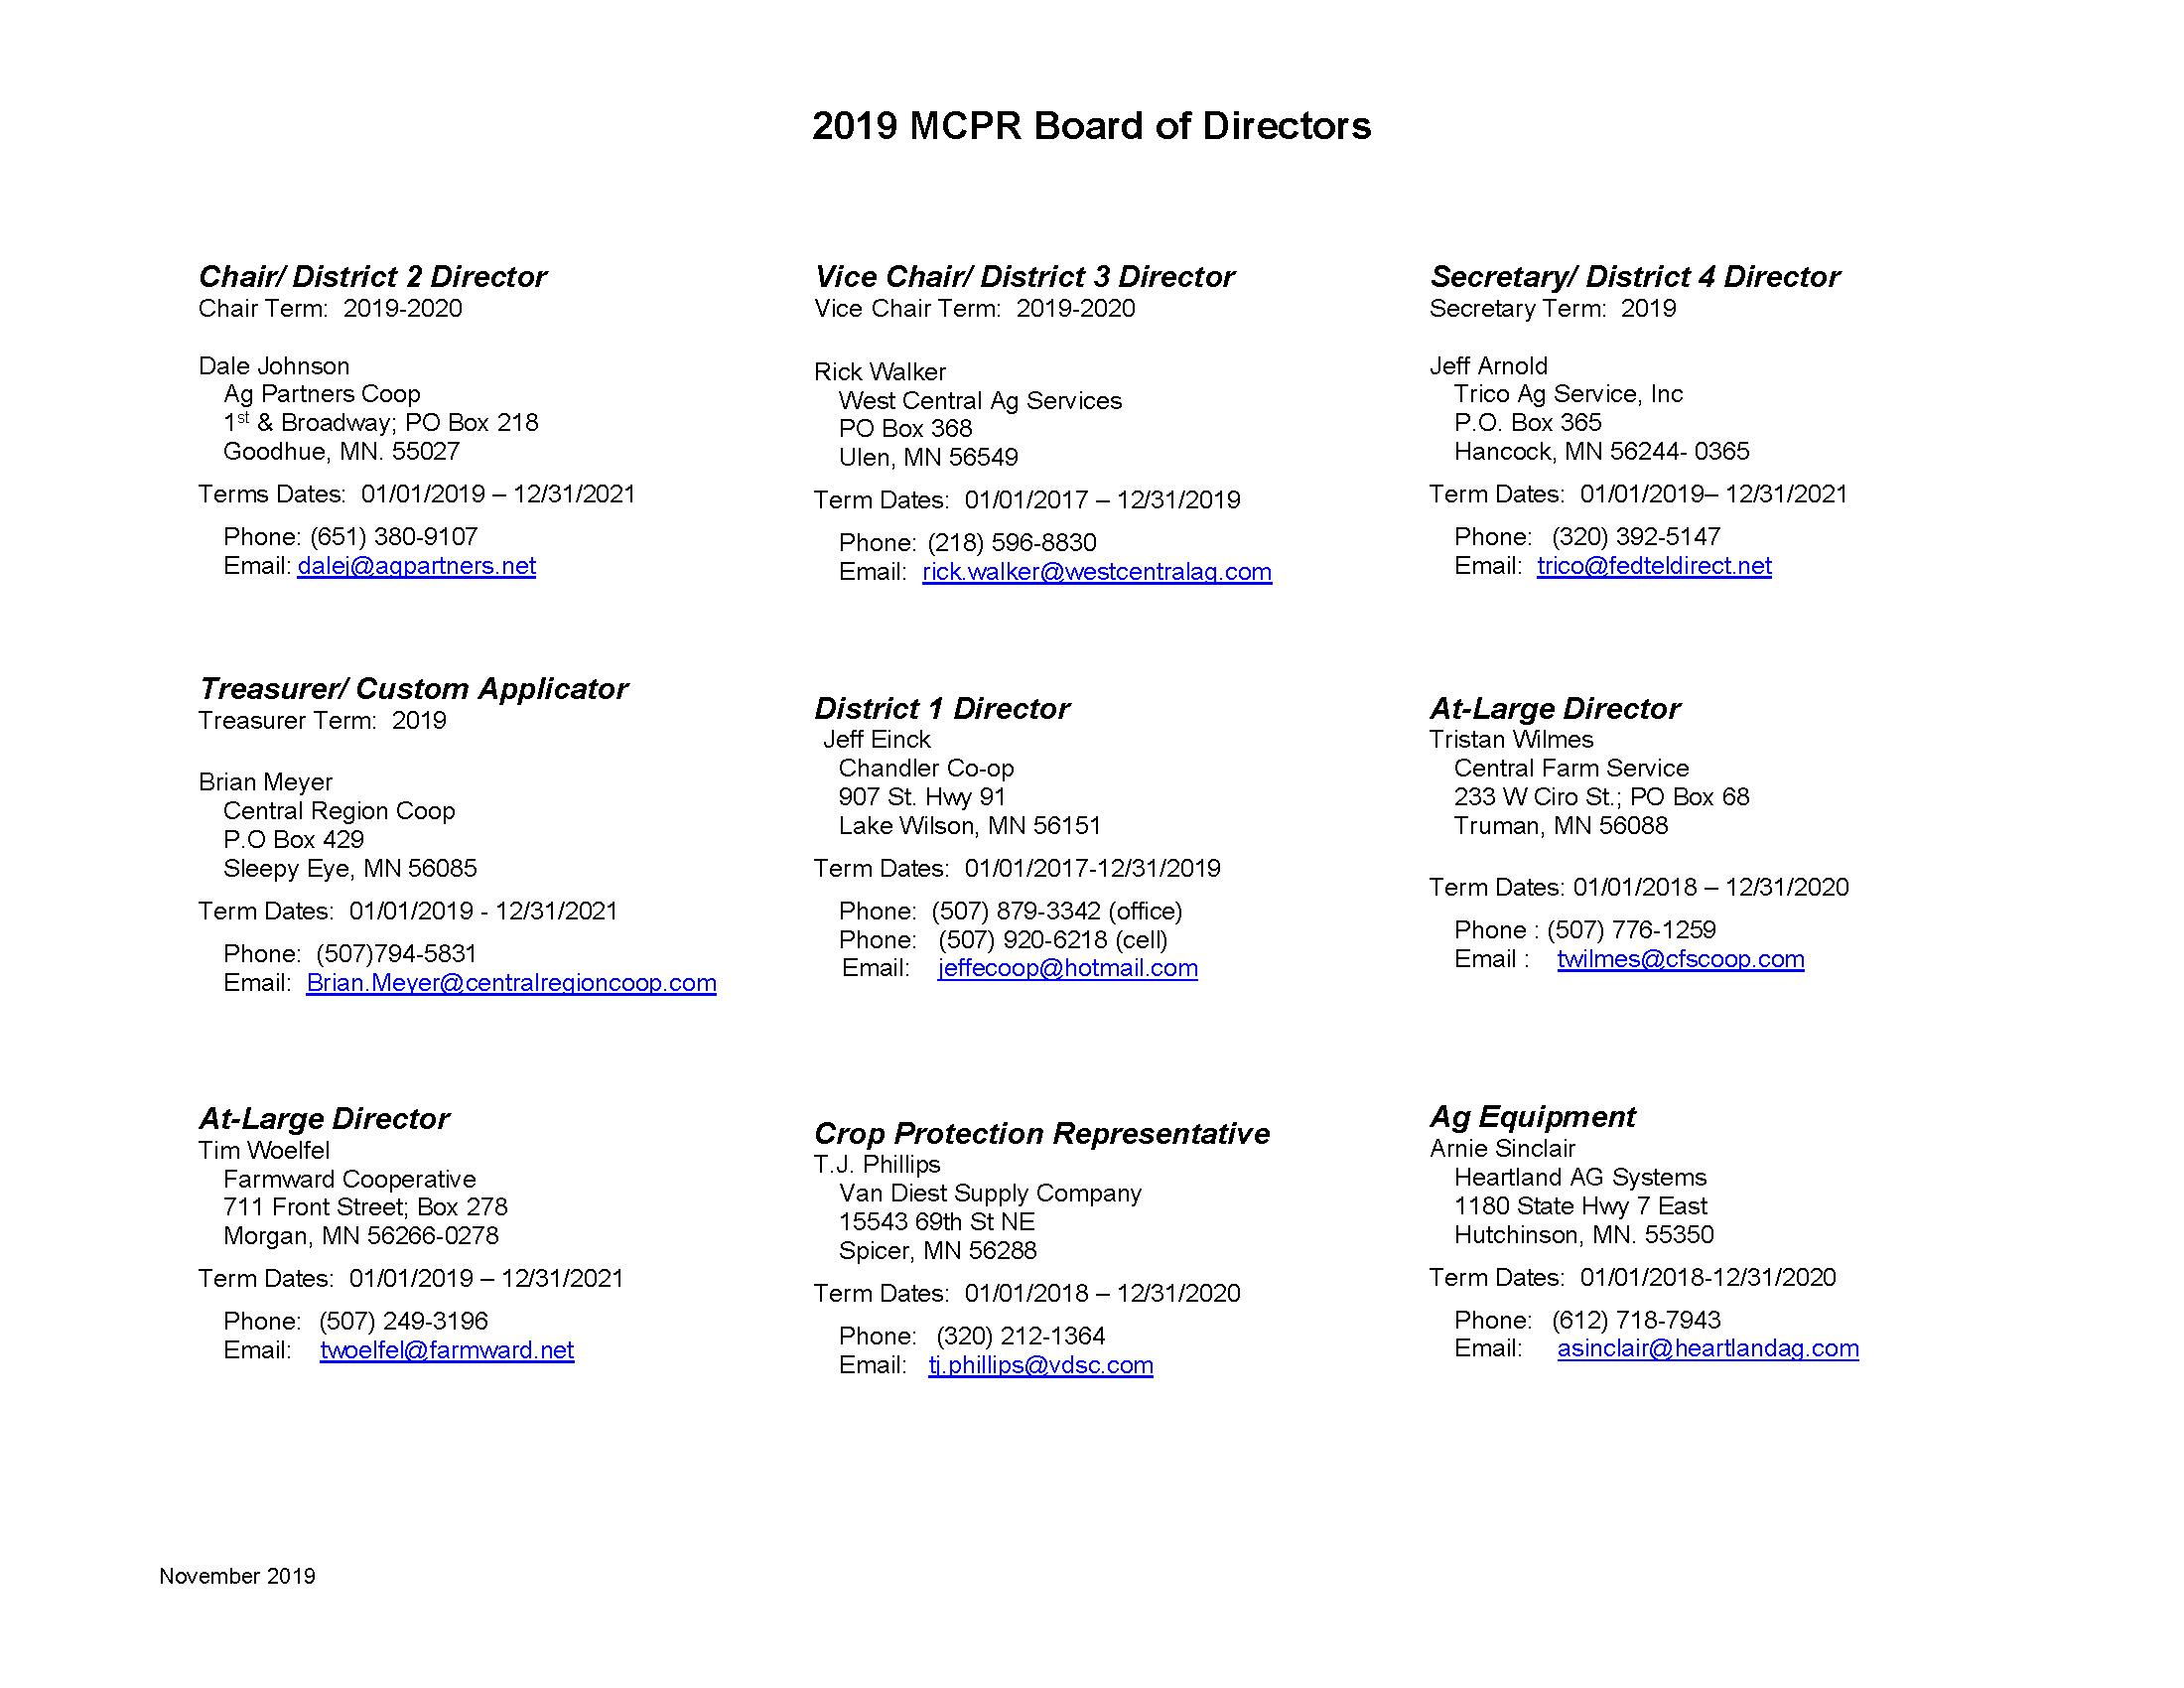 2019 MCPR Board of Directors_November_2019_Page_1